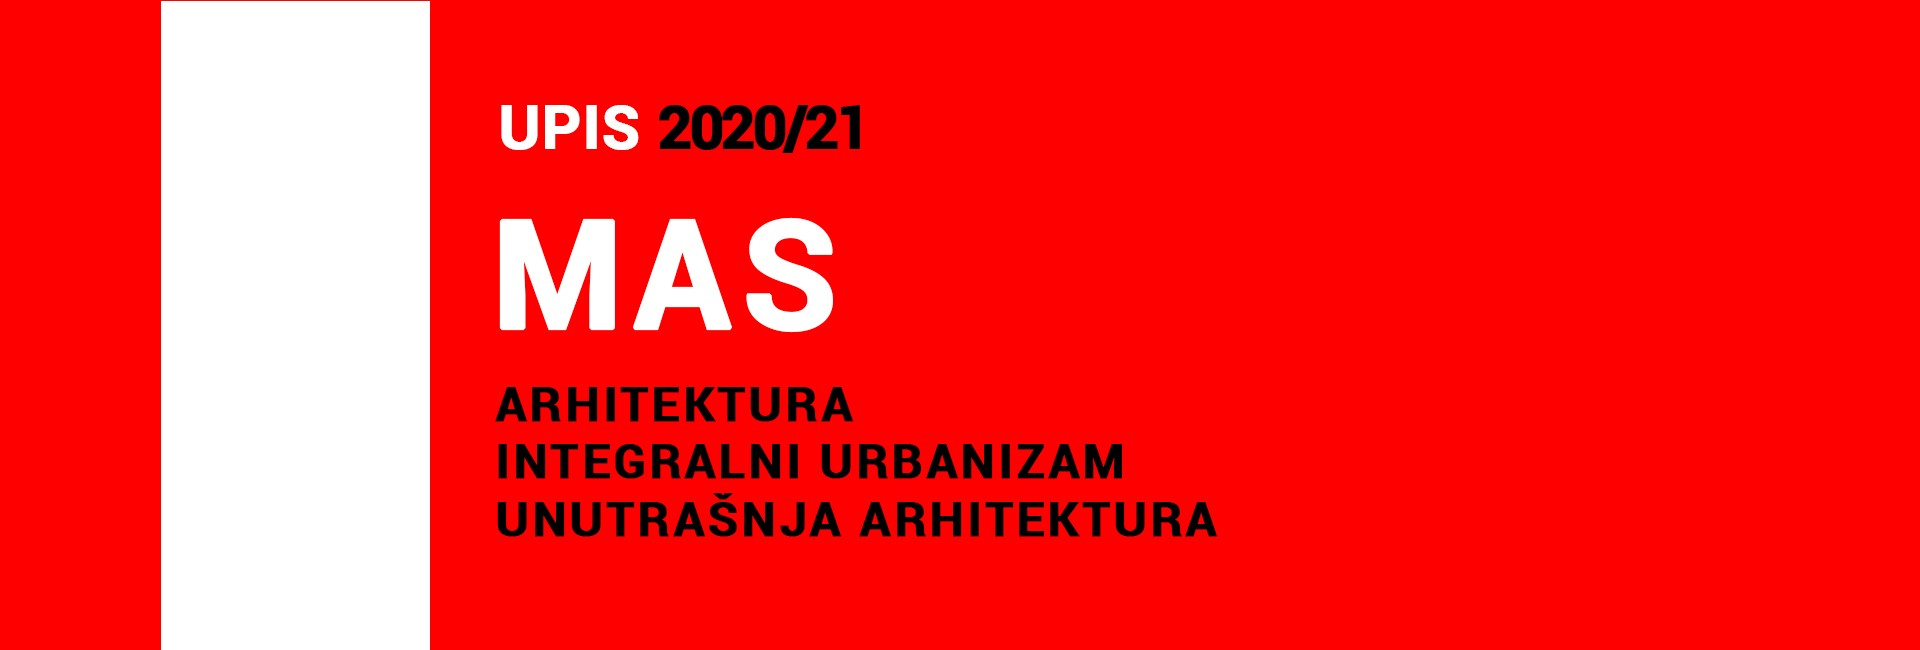 МАС 2020/21 други уписни рок: ПРЕЛИМИНАРНЕ РАНГ ЛИСТЕ